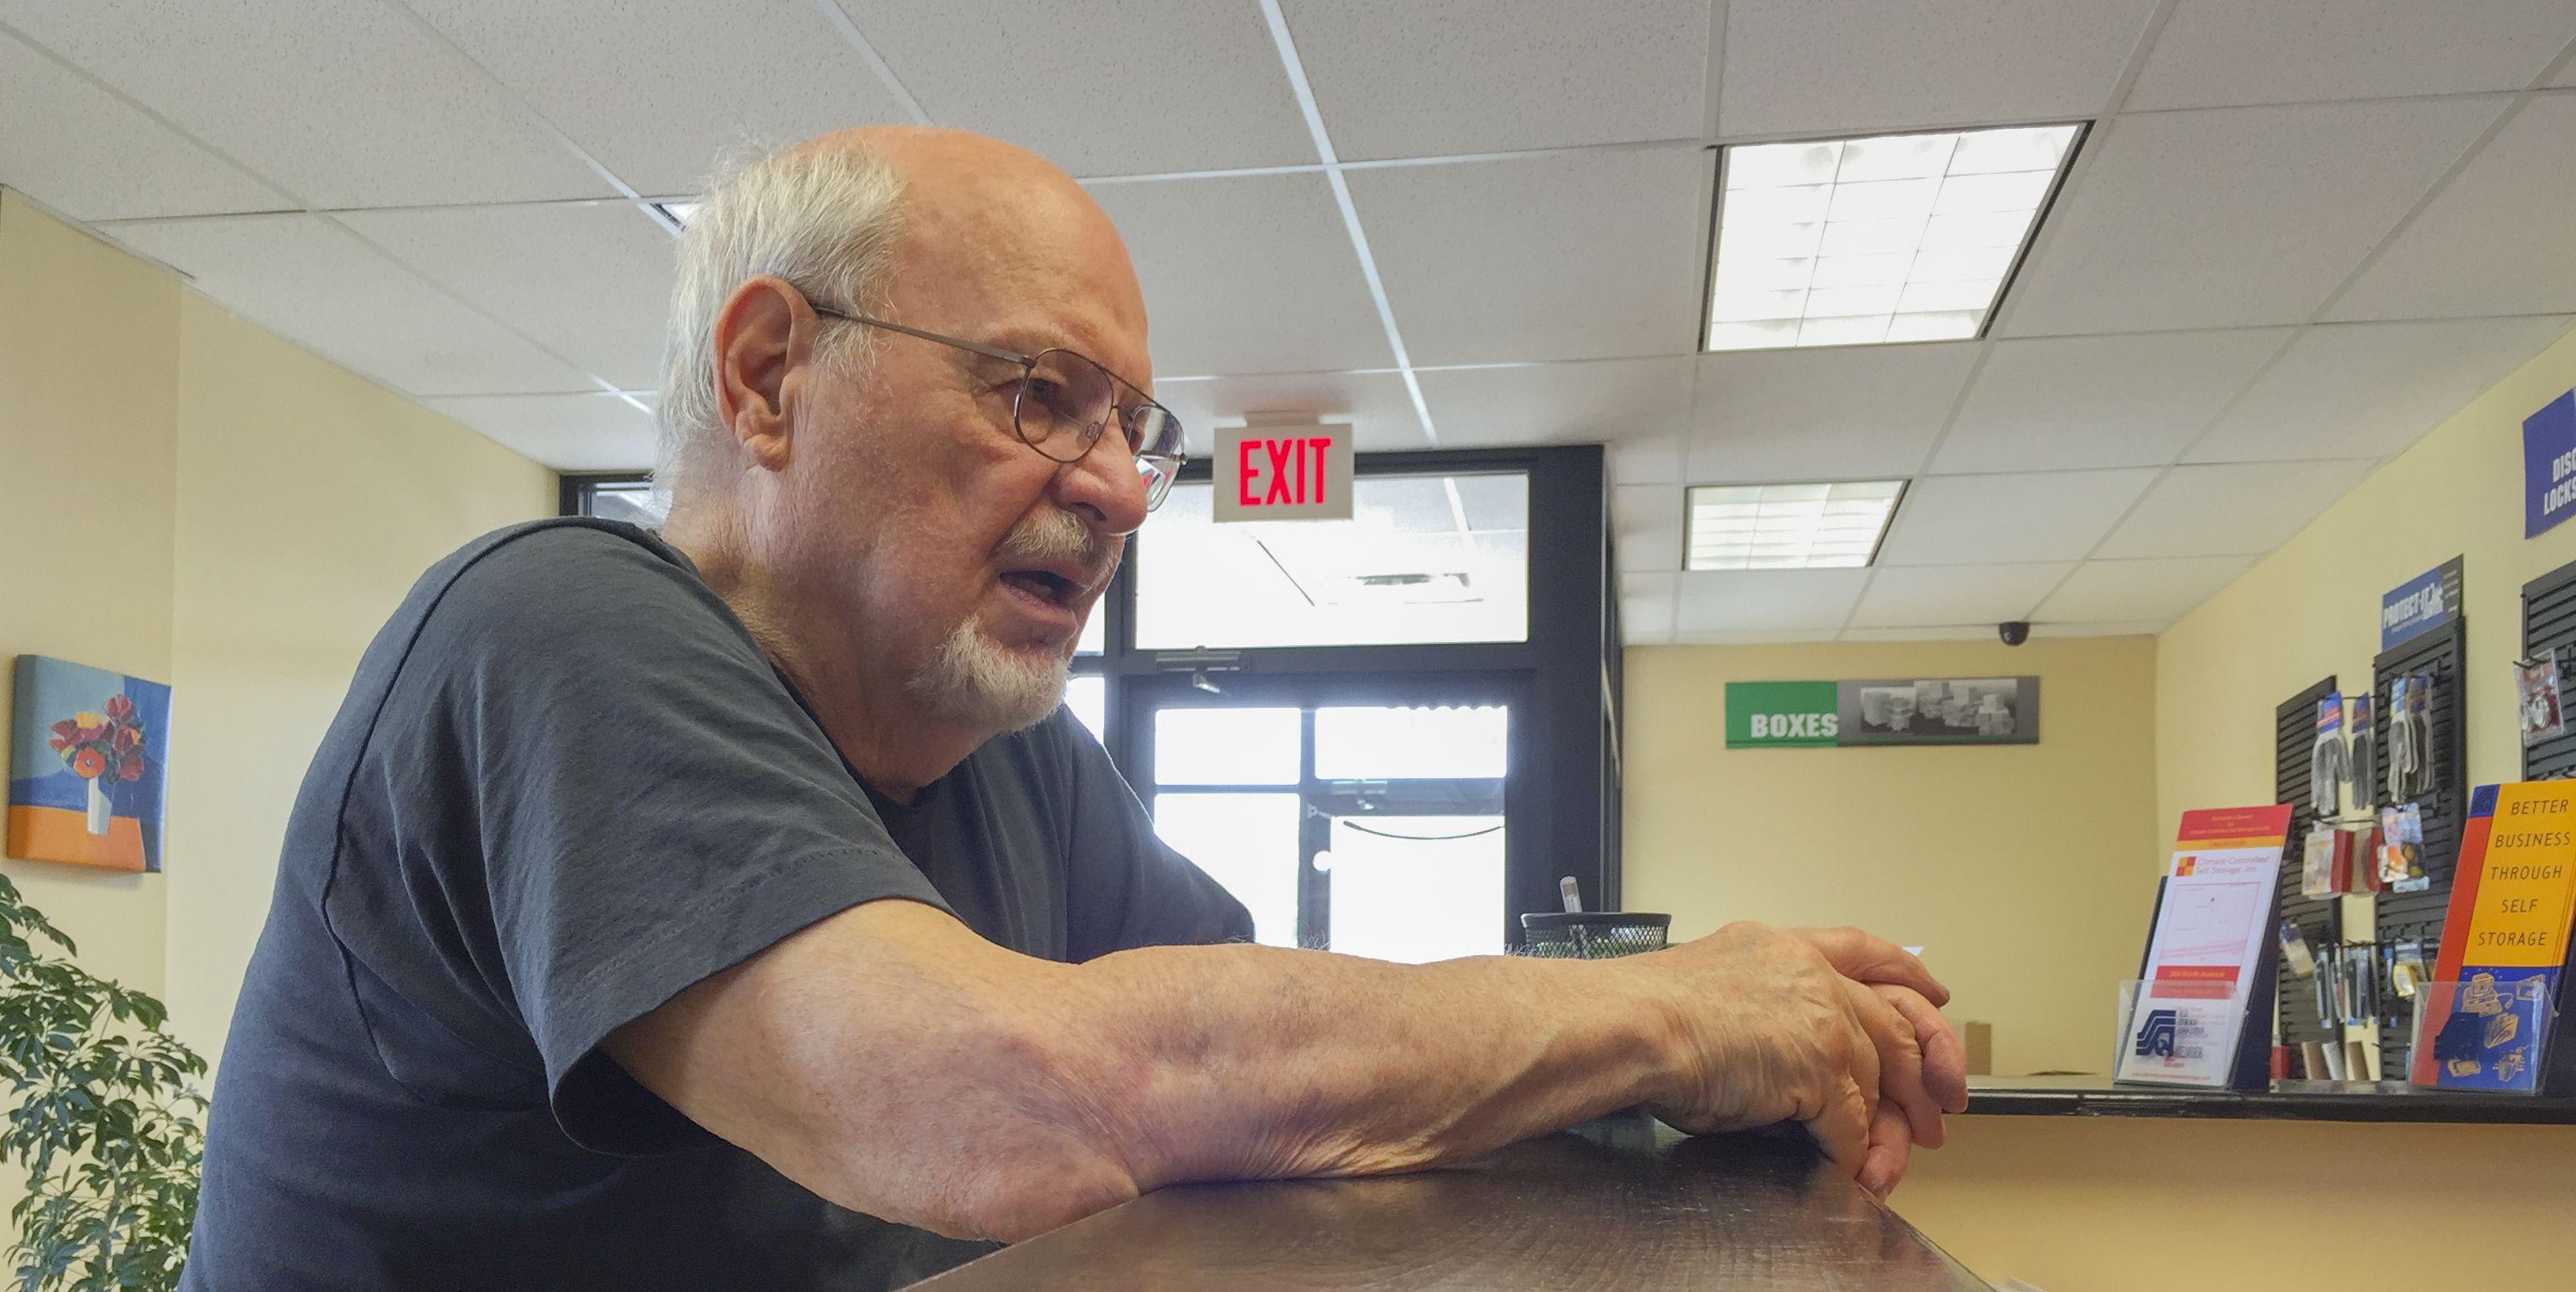 Active Senior At Customer Service Counter